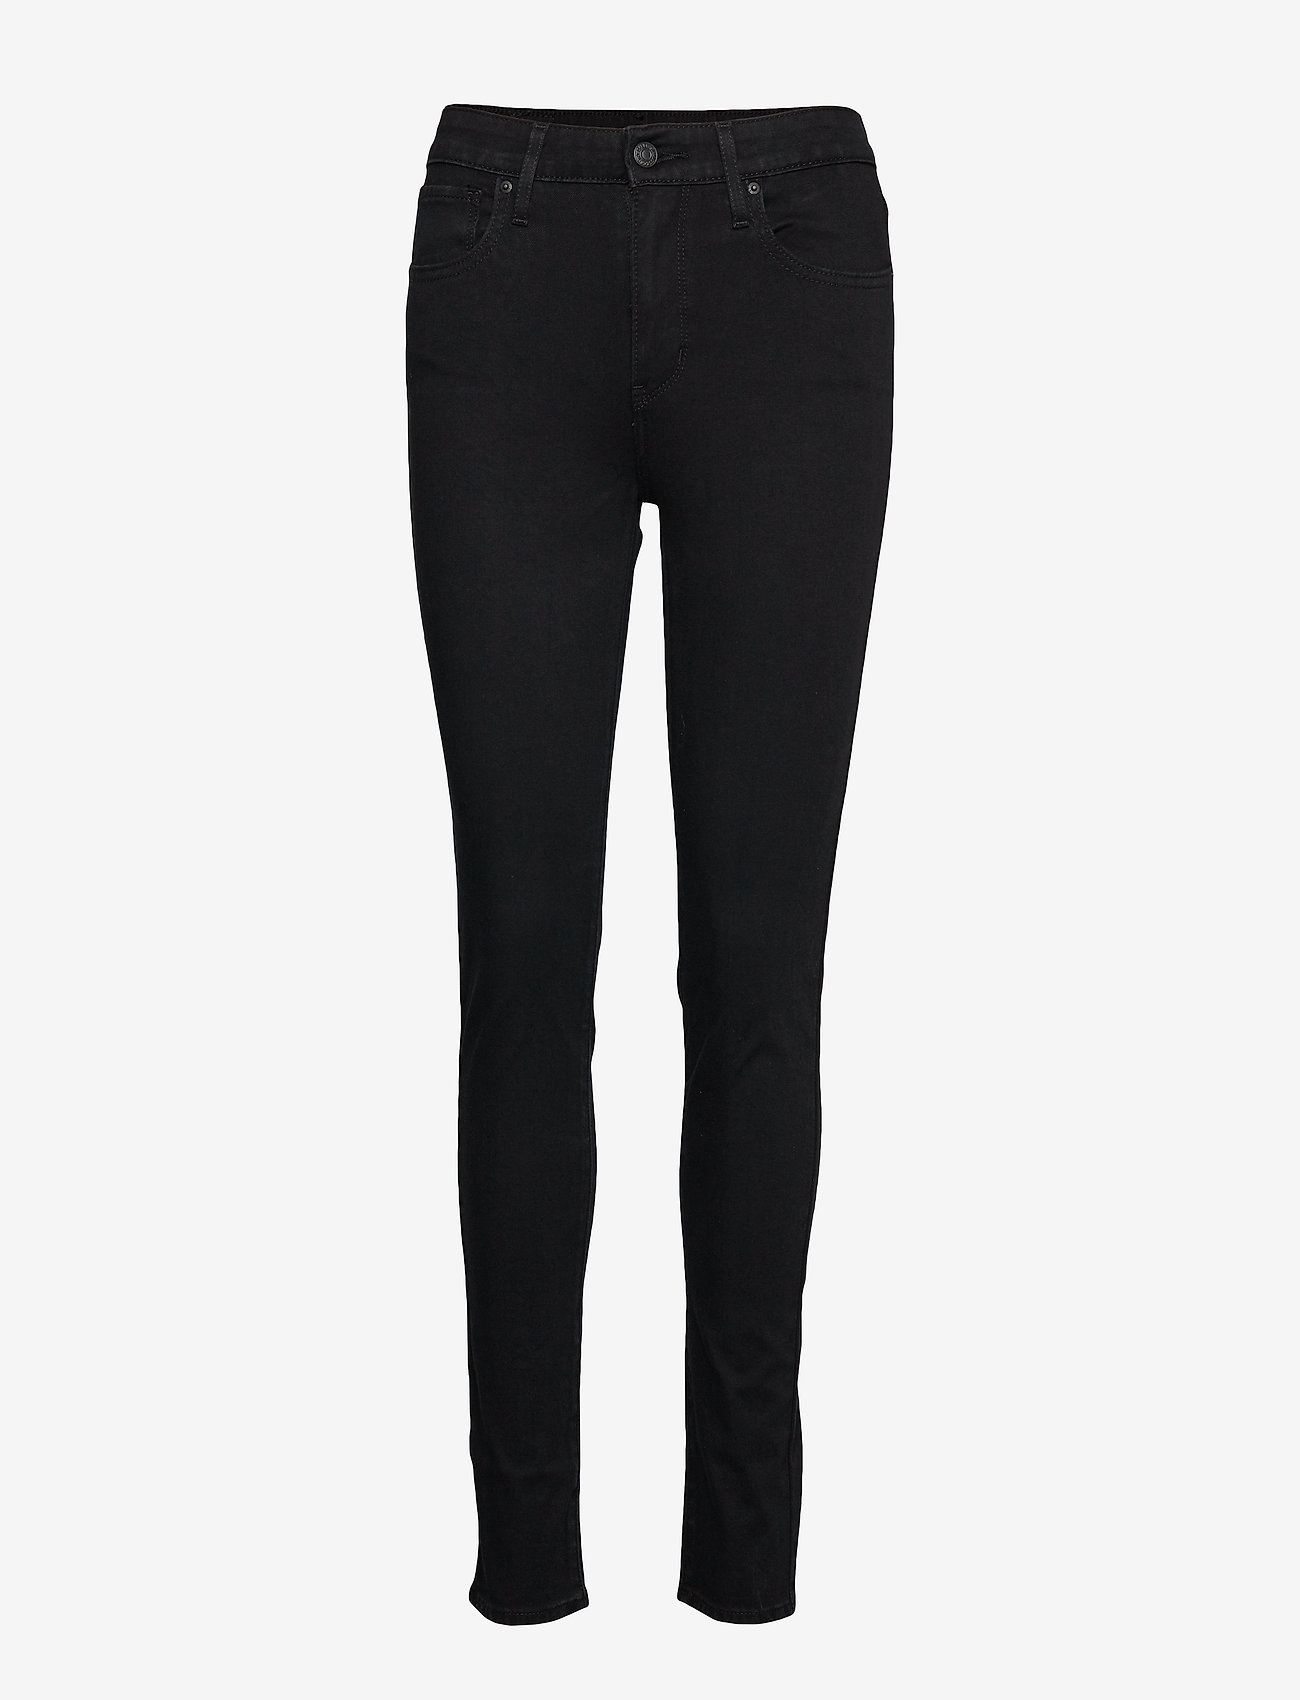 LEVI´S Women - 721 HIGH RISE SKINNY LONG SHOT - skinny jeans - blacks - 0